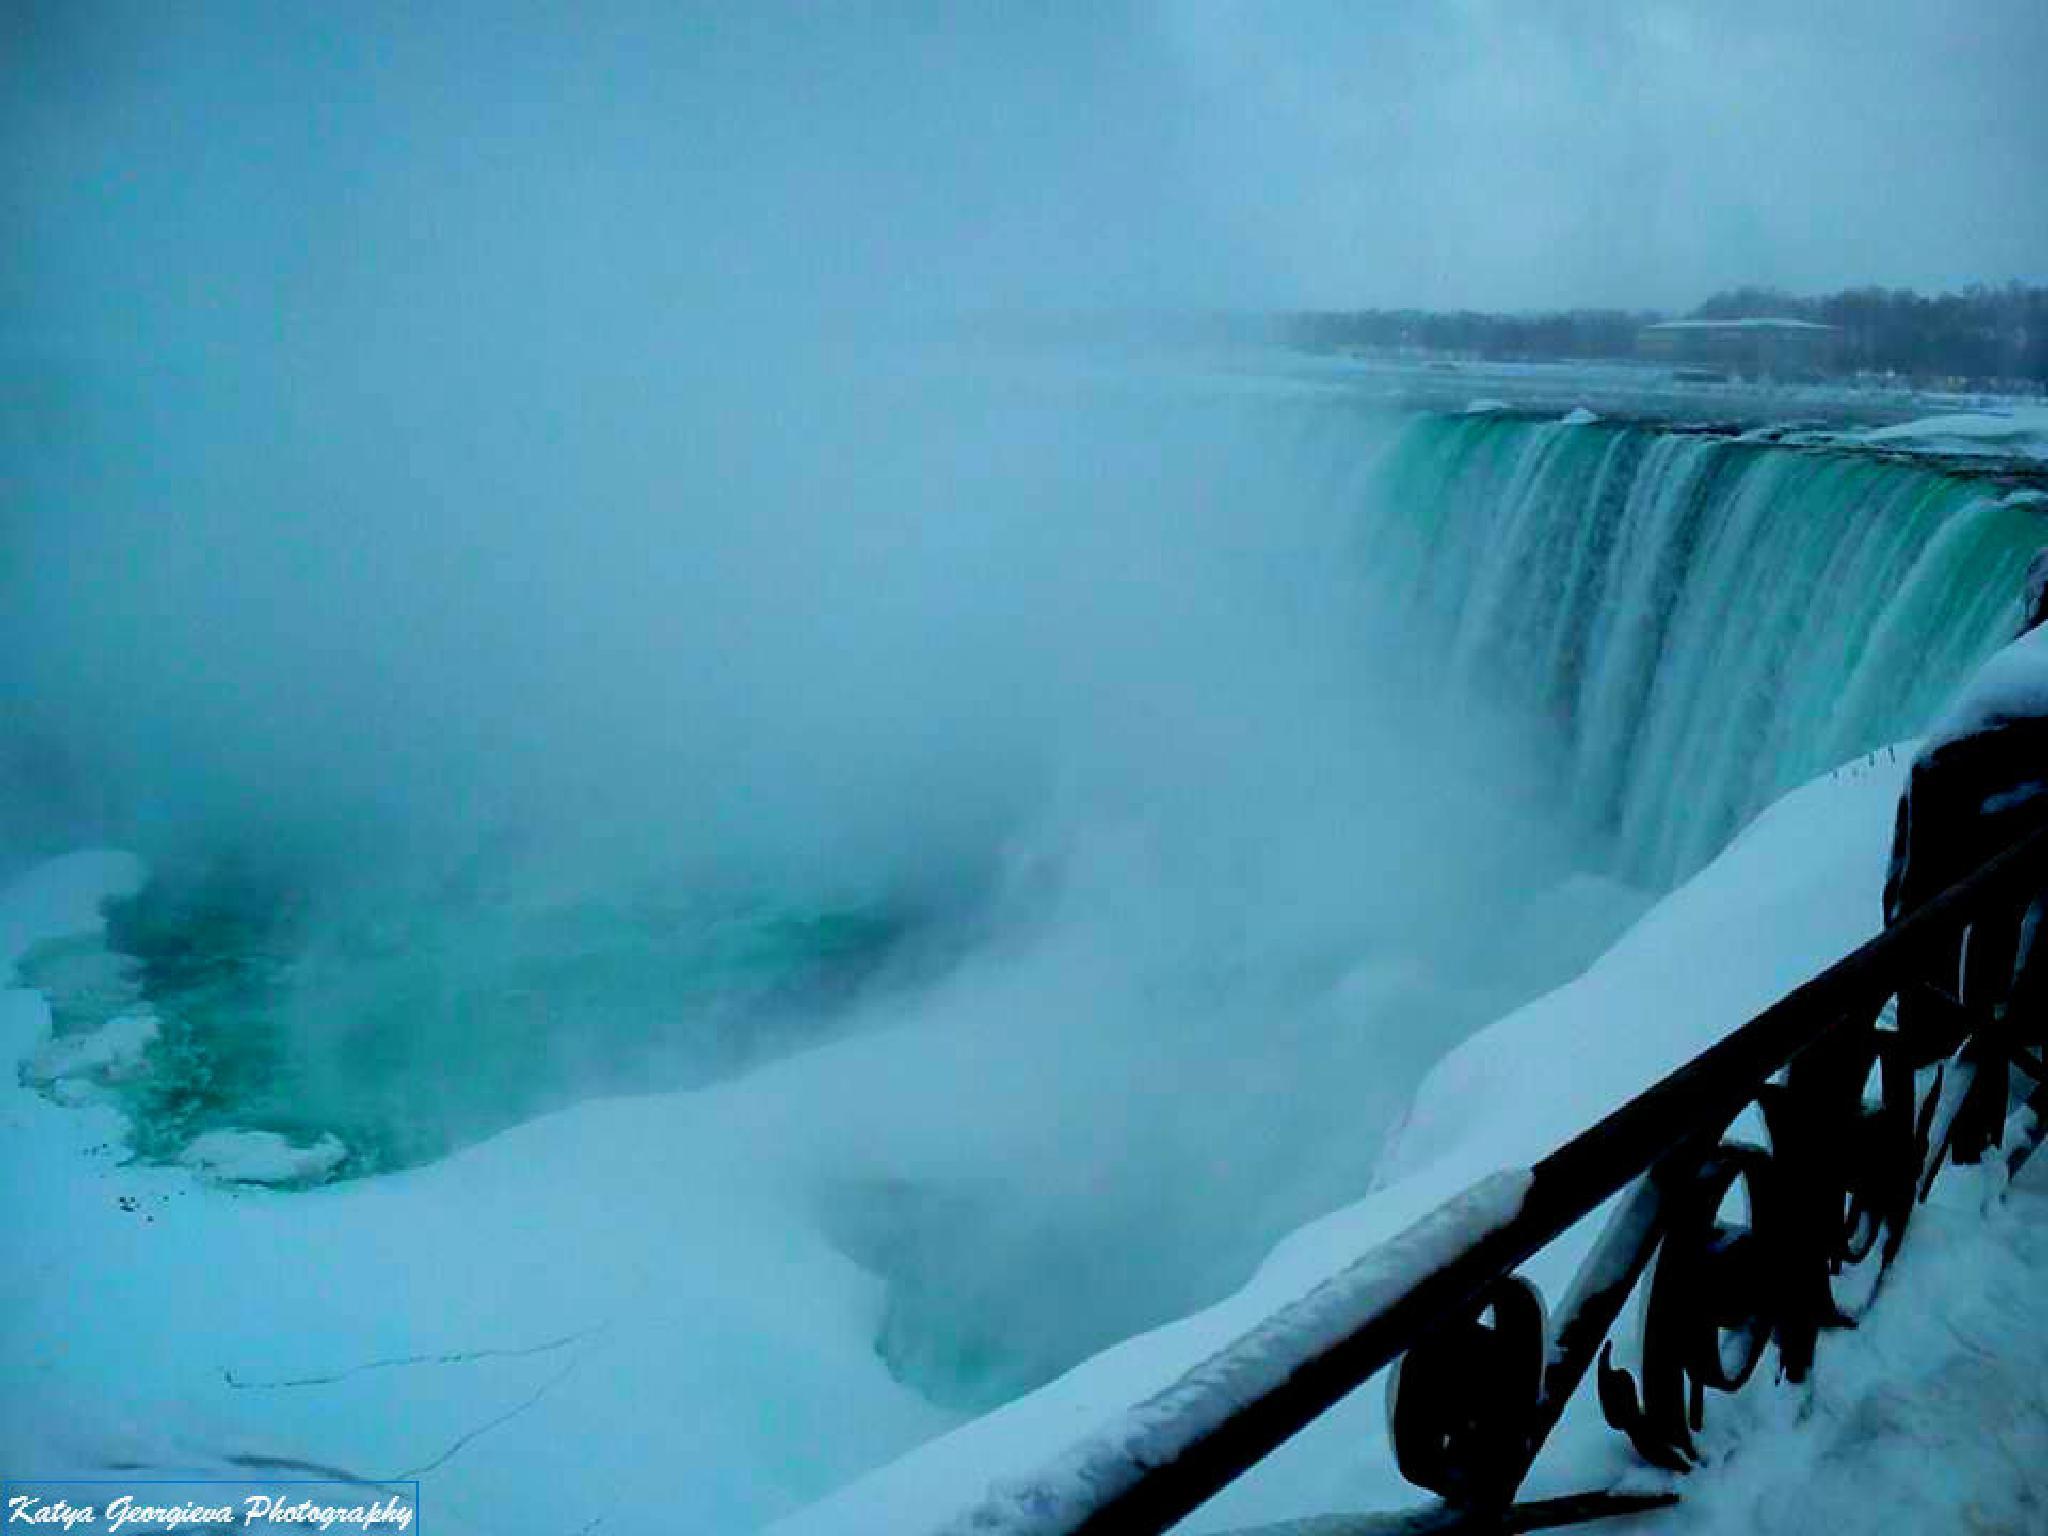 Winter series of photos of Niagara Falls by Katya Georgieva Photography